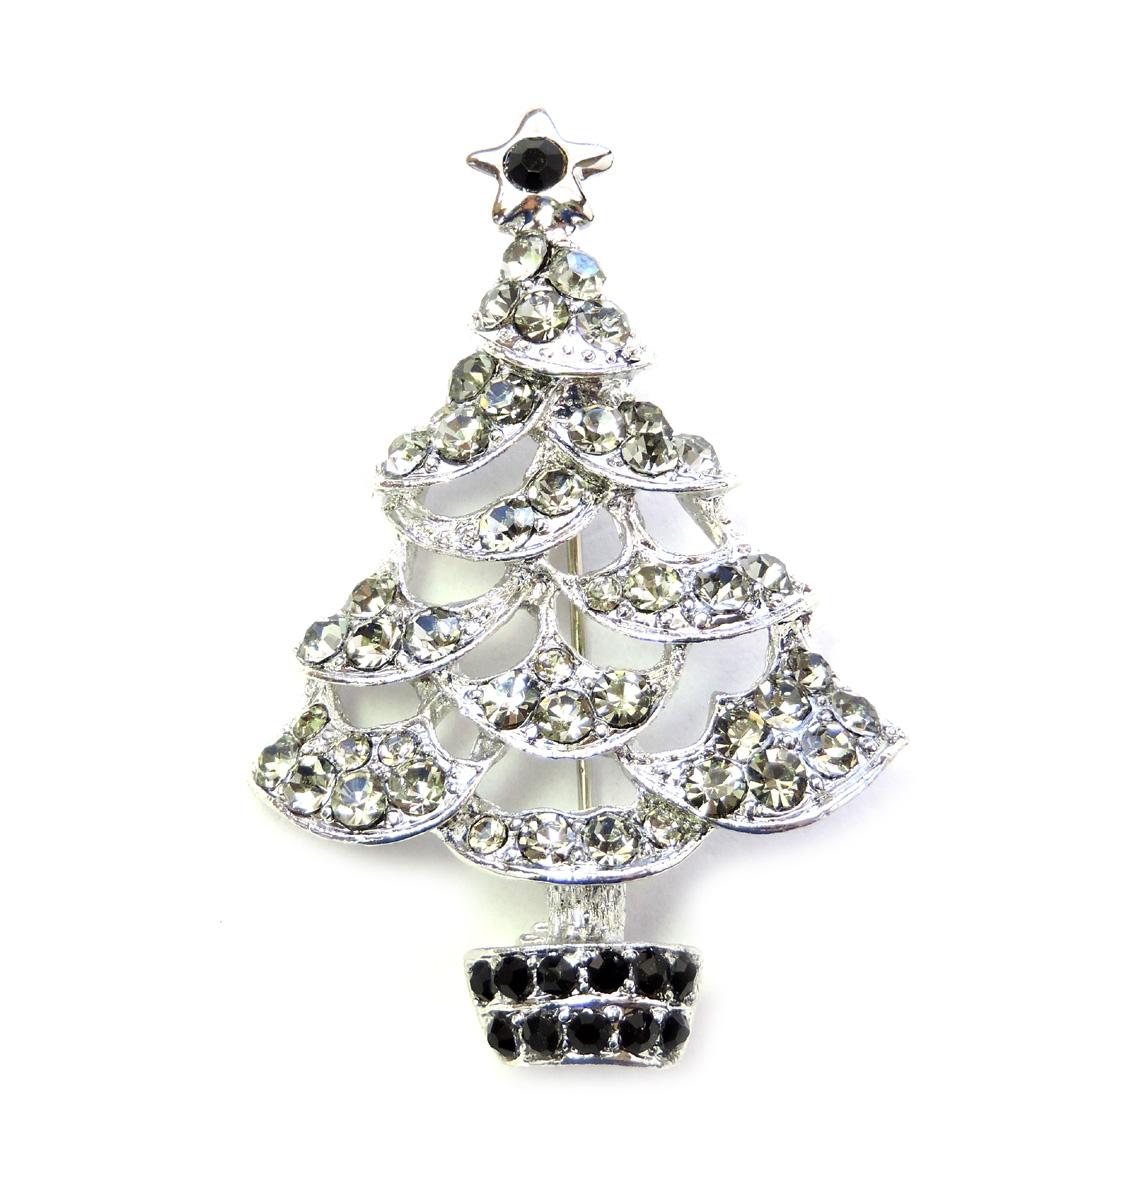 Broszki I Szpilki Mickey Mouse Christmas Tree Pin Brooch Red Black Rhinestone Crystal Bizuteria I Zegarki Mayoshop Org